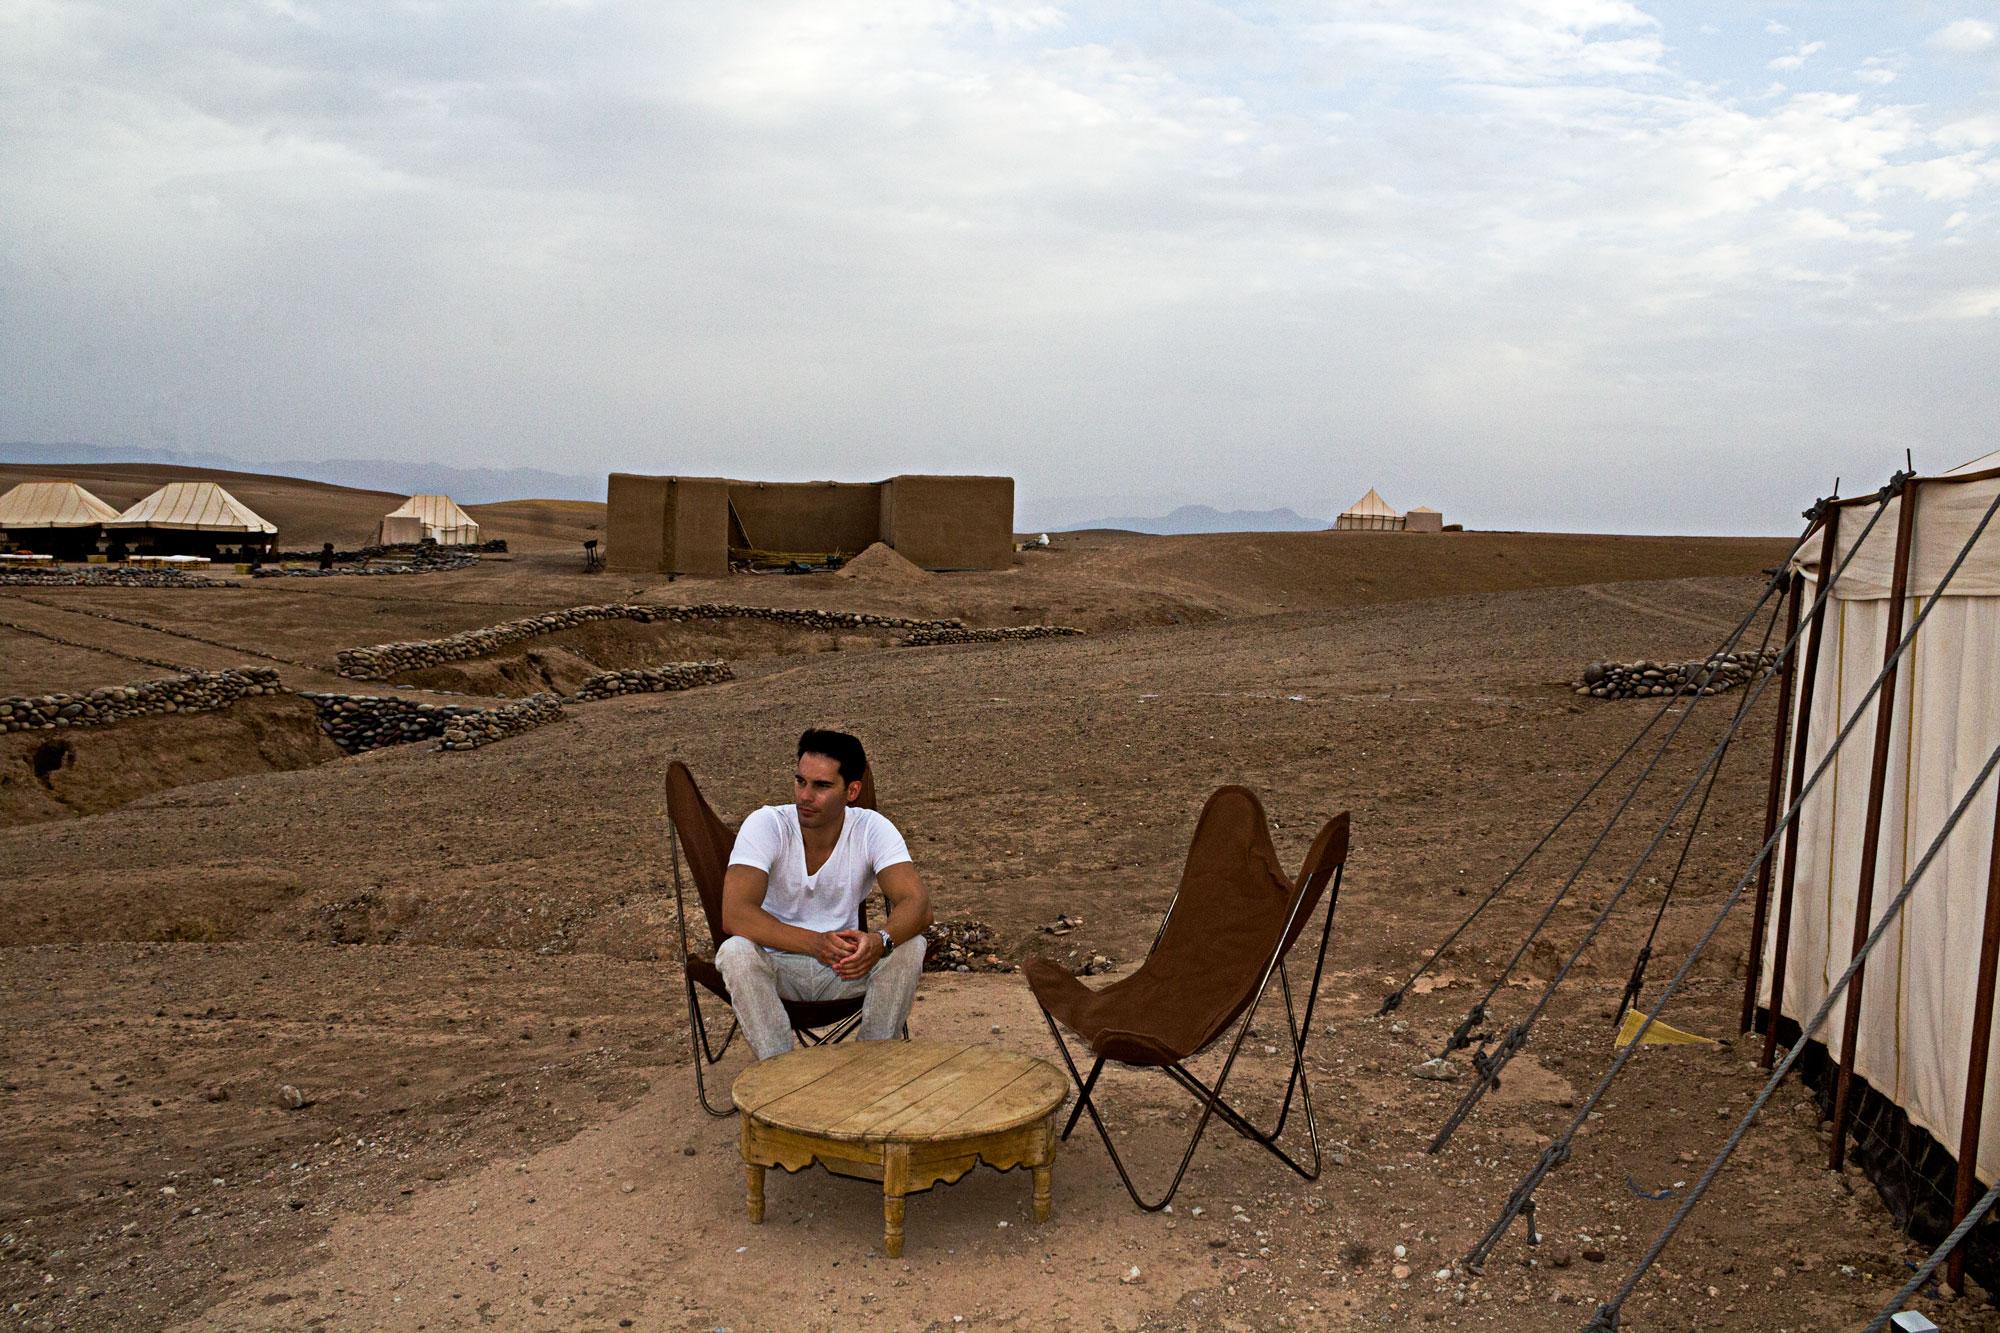 Morocco_Luxury_ Experience_Vukota_Brajovic